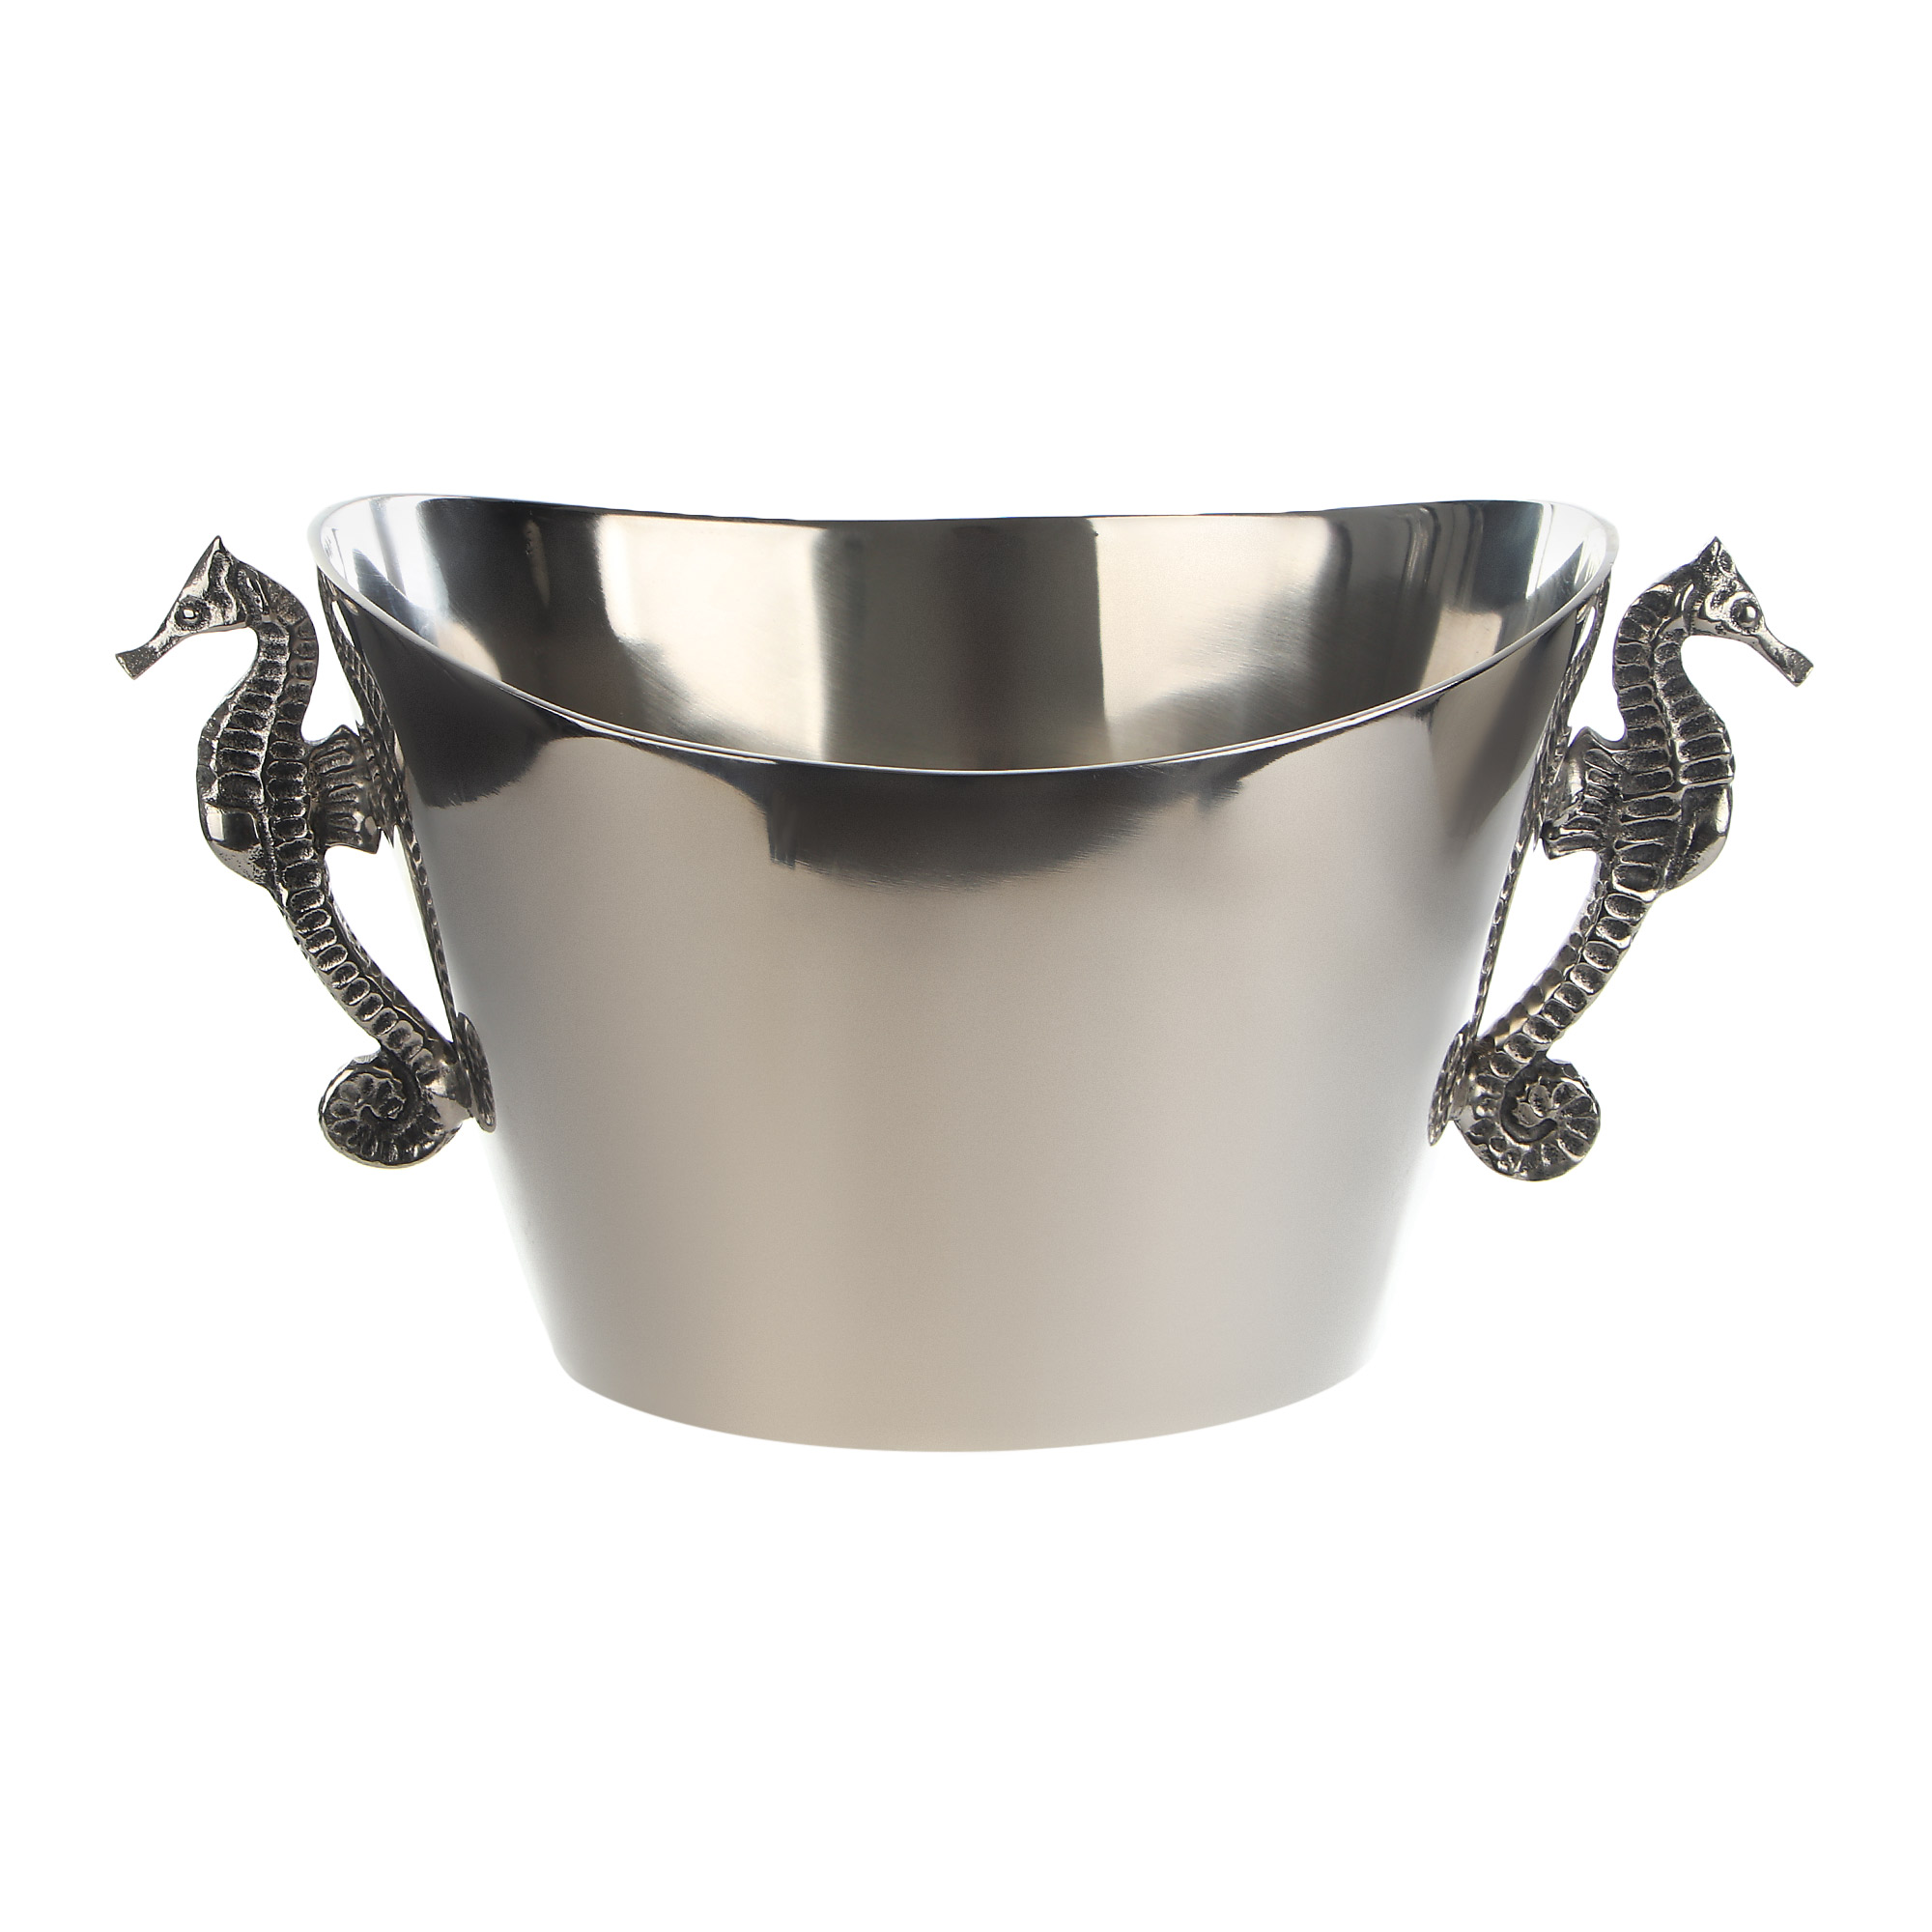 Ведерко для охлаждения напитков Universal Seahorse 35х21х19